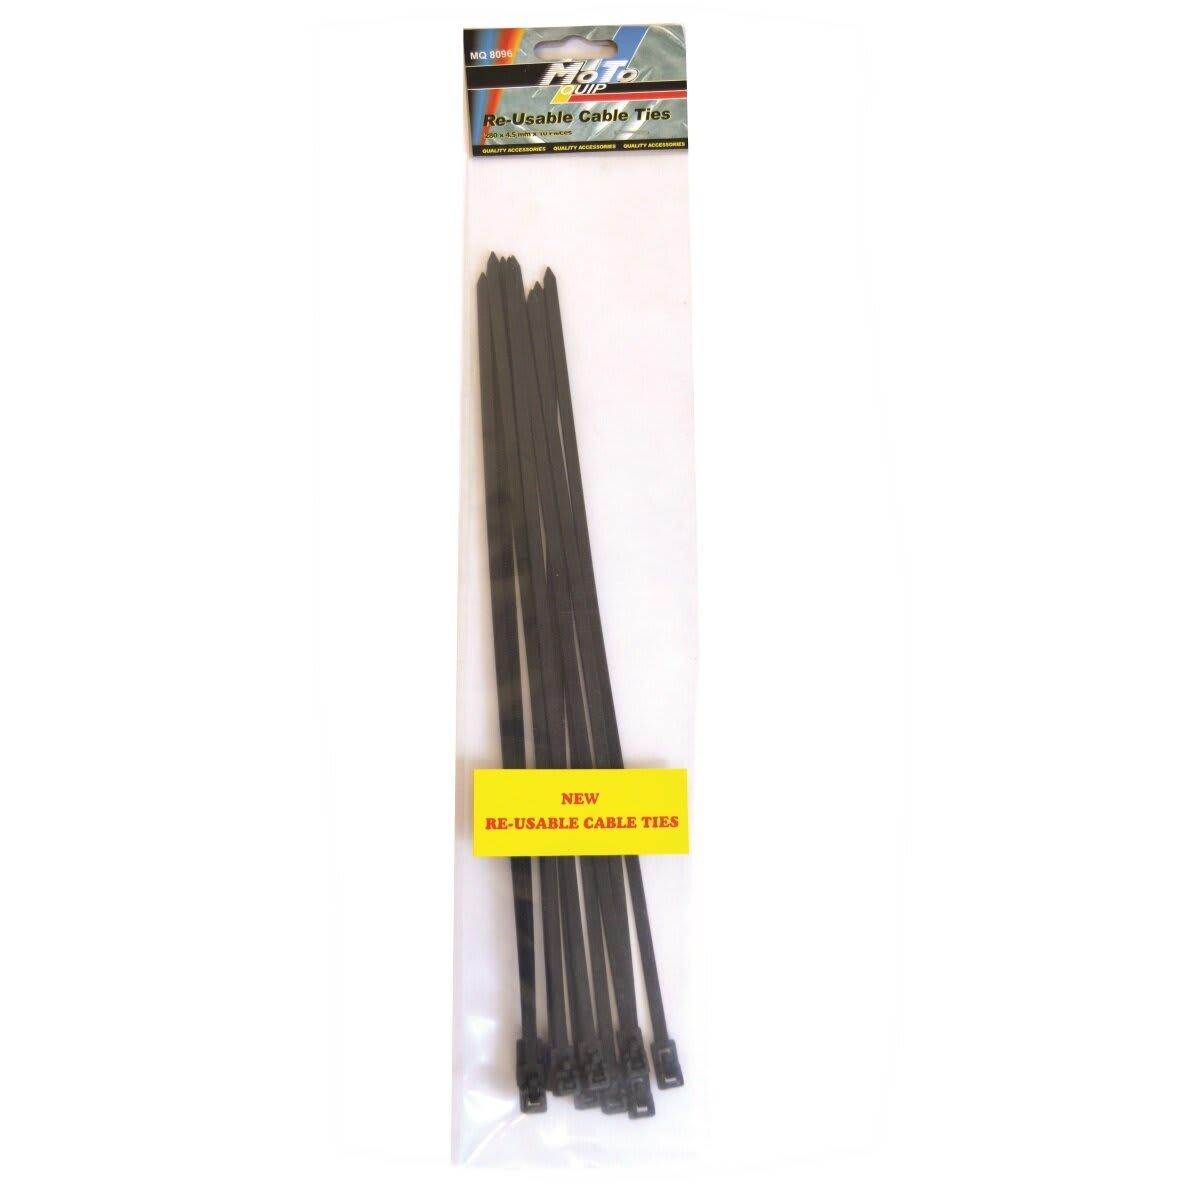 Moto-Quip Reuseable Cable Tie 4.5mm x 280mm 10pc